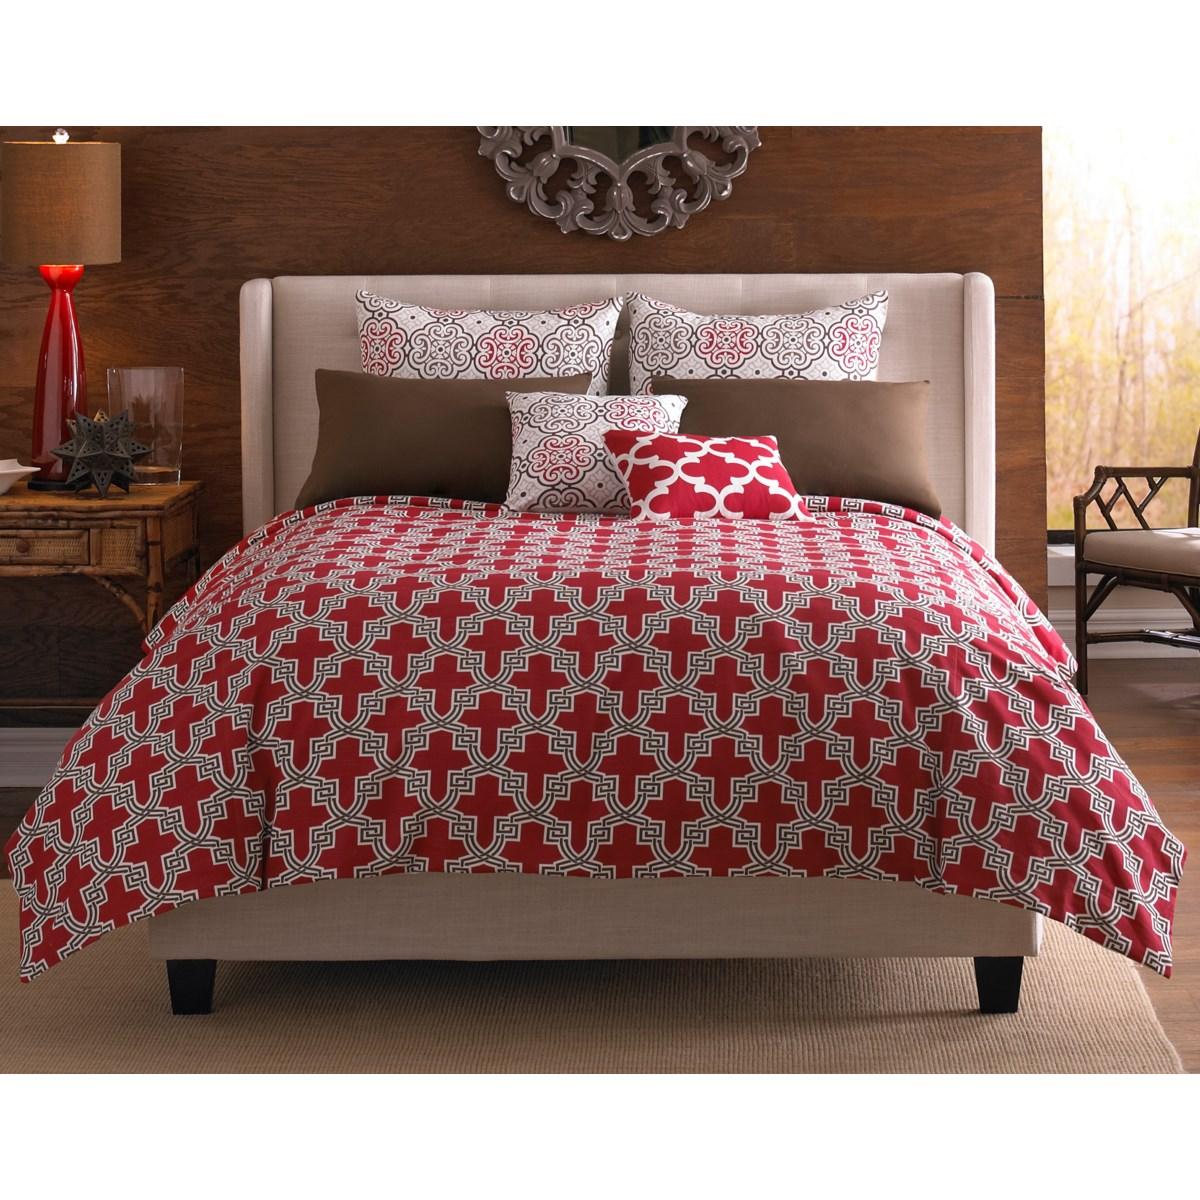 Sinbad 3 pc Twin Comforter Set (Made In USA)